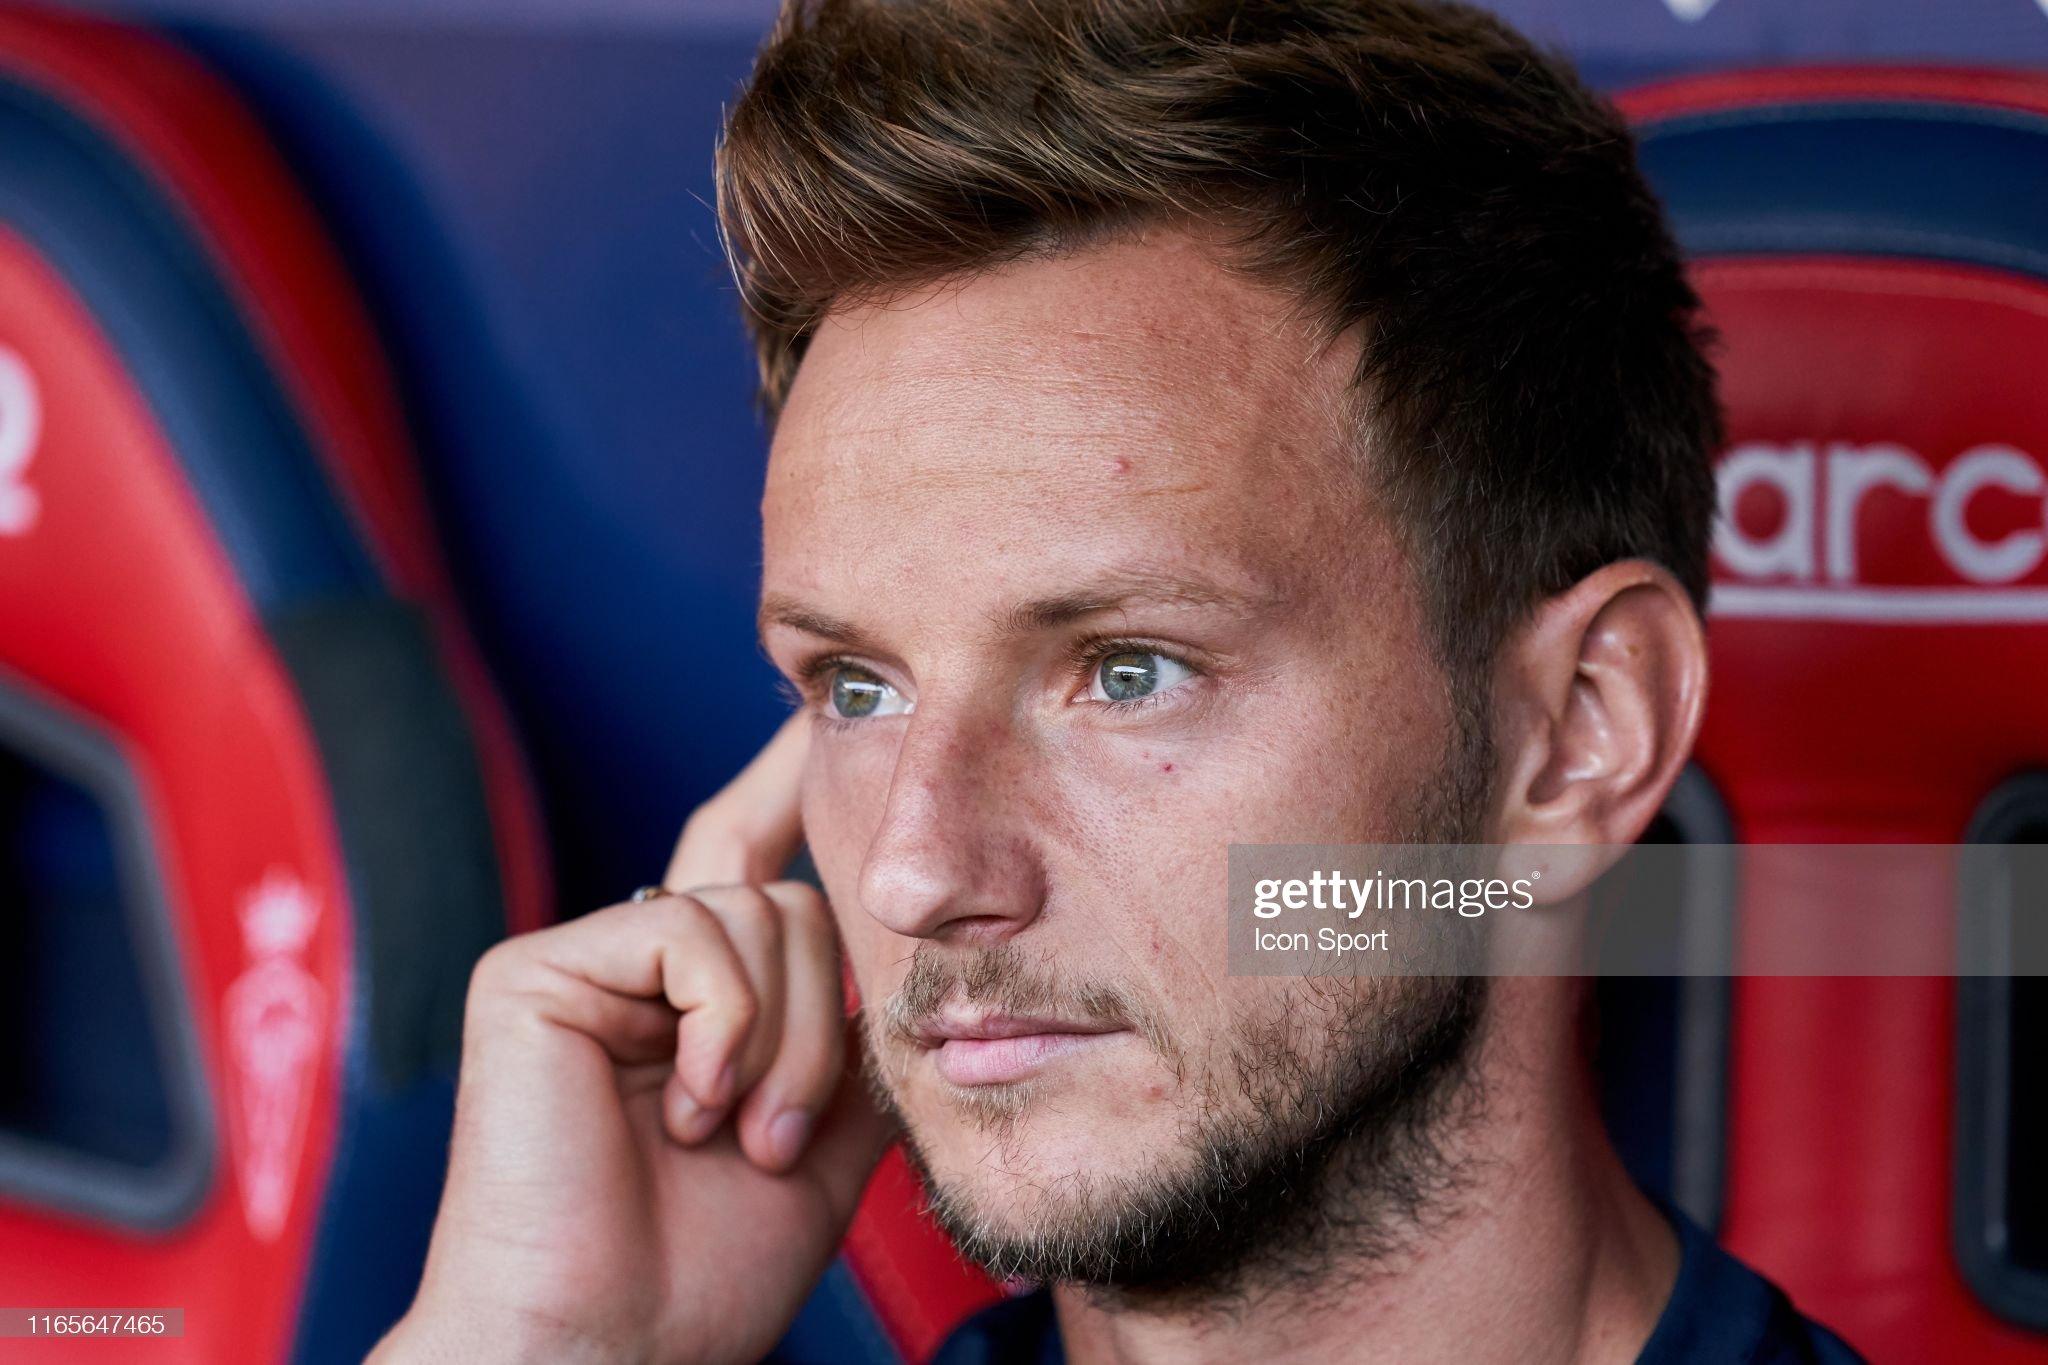 صور مباراة : أوساسونا - برشلونة 2-2 ( 31-08-2019 )  Ivan-rakitic-of-fc-barcelona-during-the-liga-match-between-osasuna-picture-id1165647465?s=2048x2048